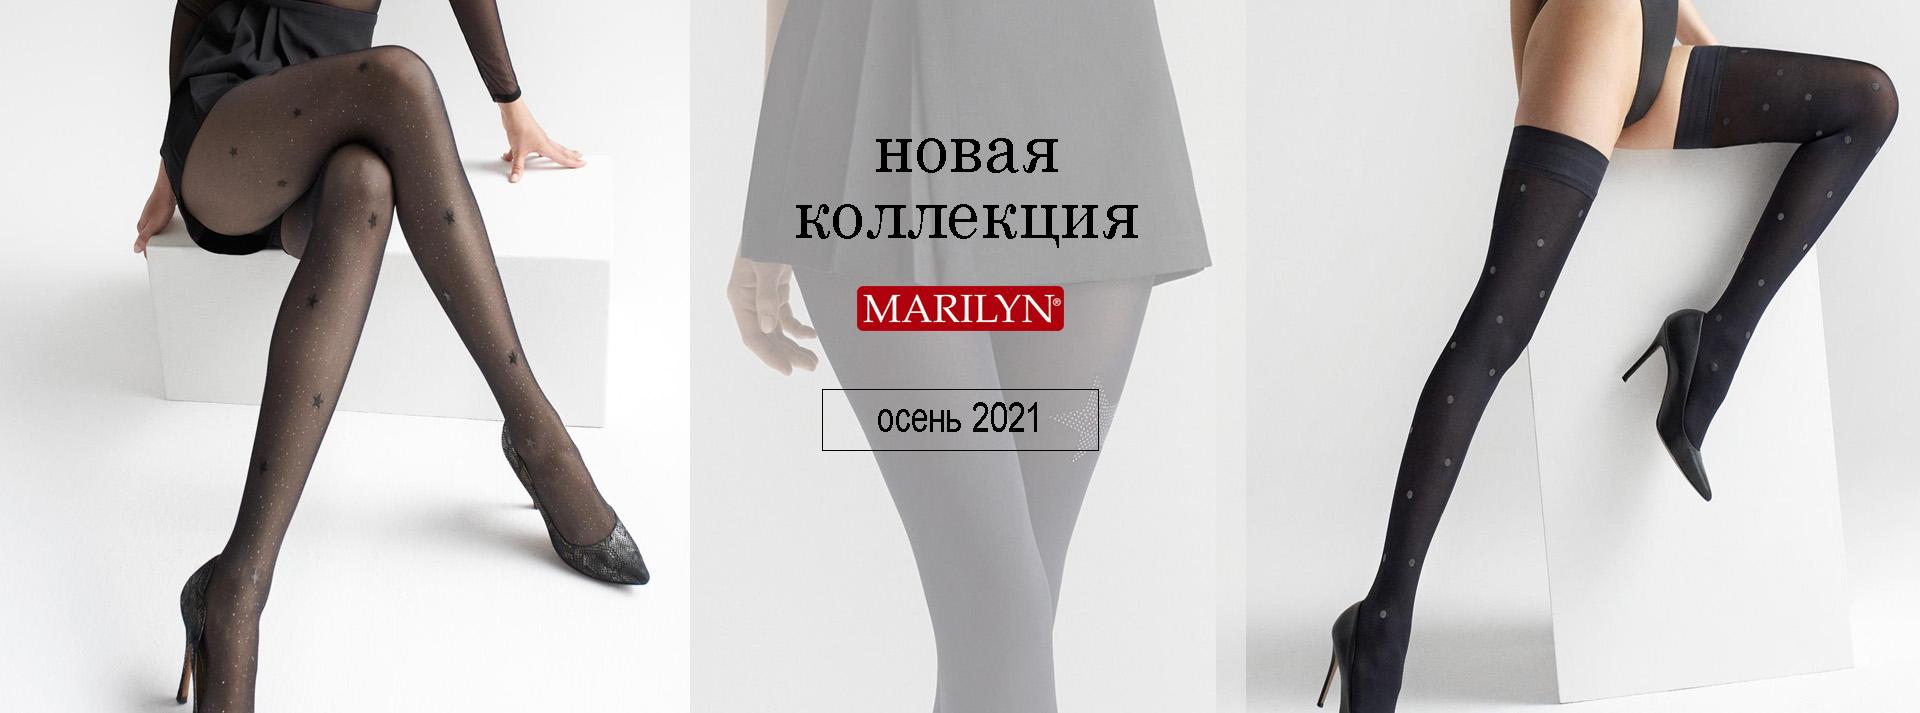 Marilyn 2021 осень